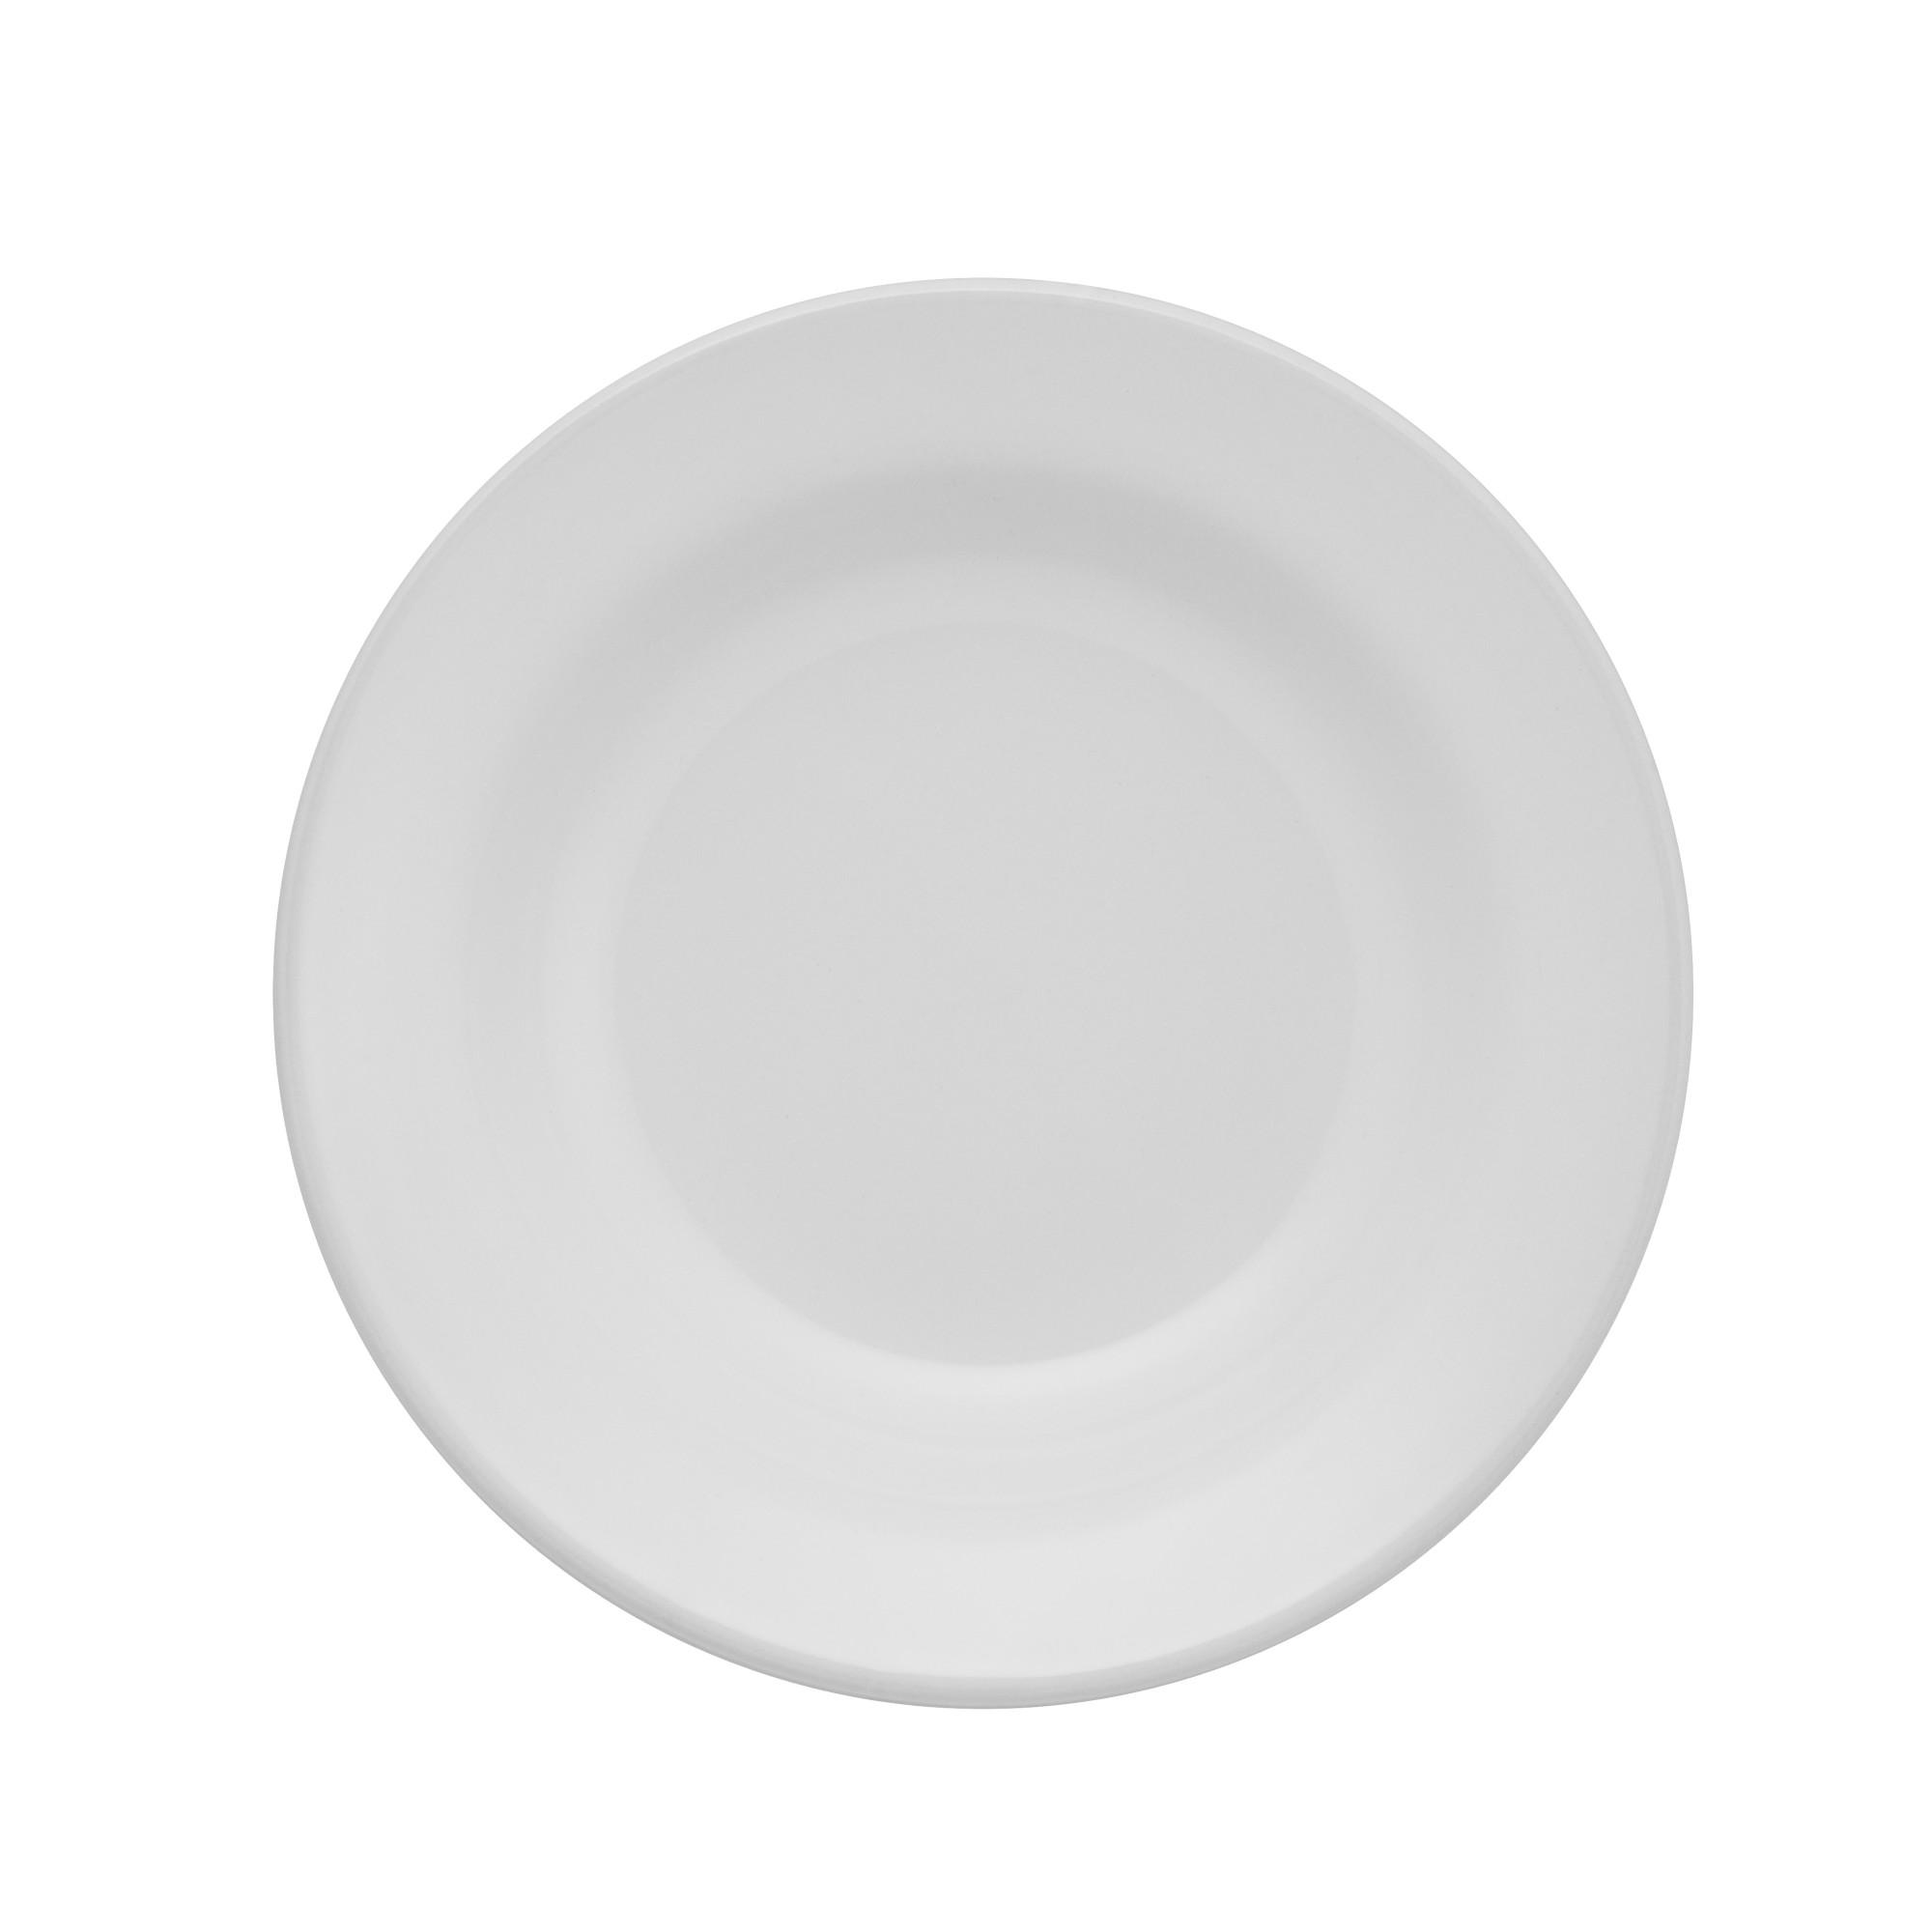 Prato Fundo Redondo em Ceramica Vitramik 22cm - Oxford